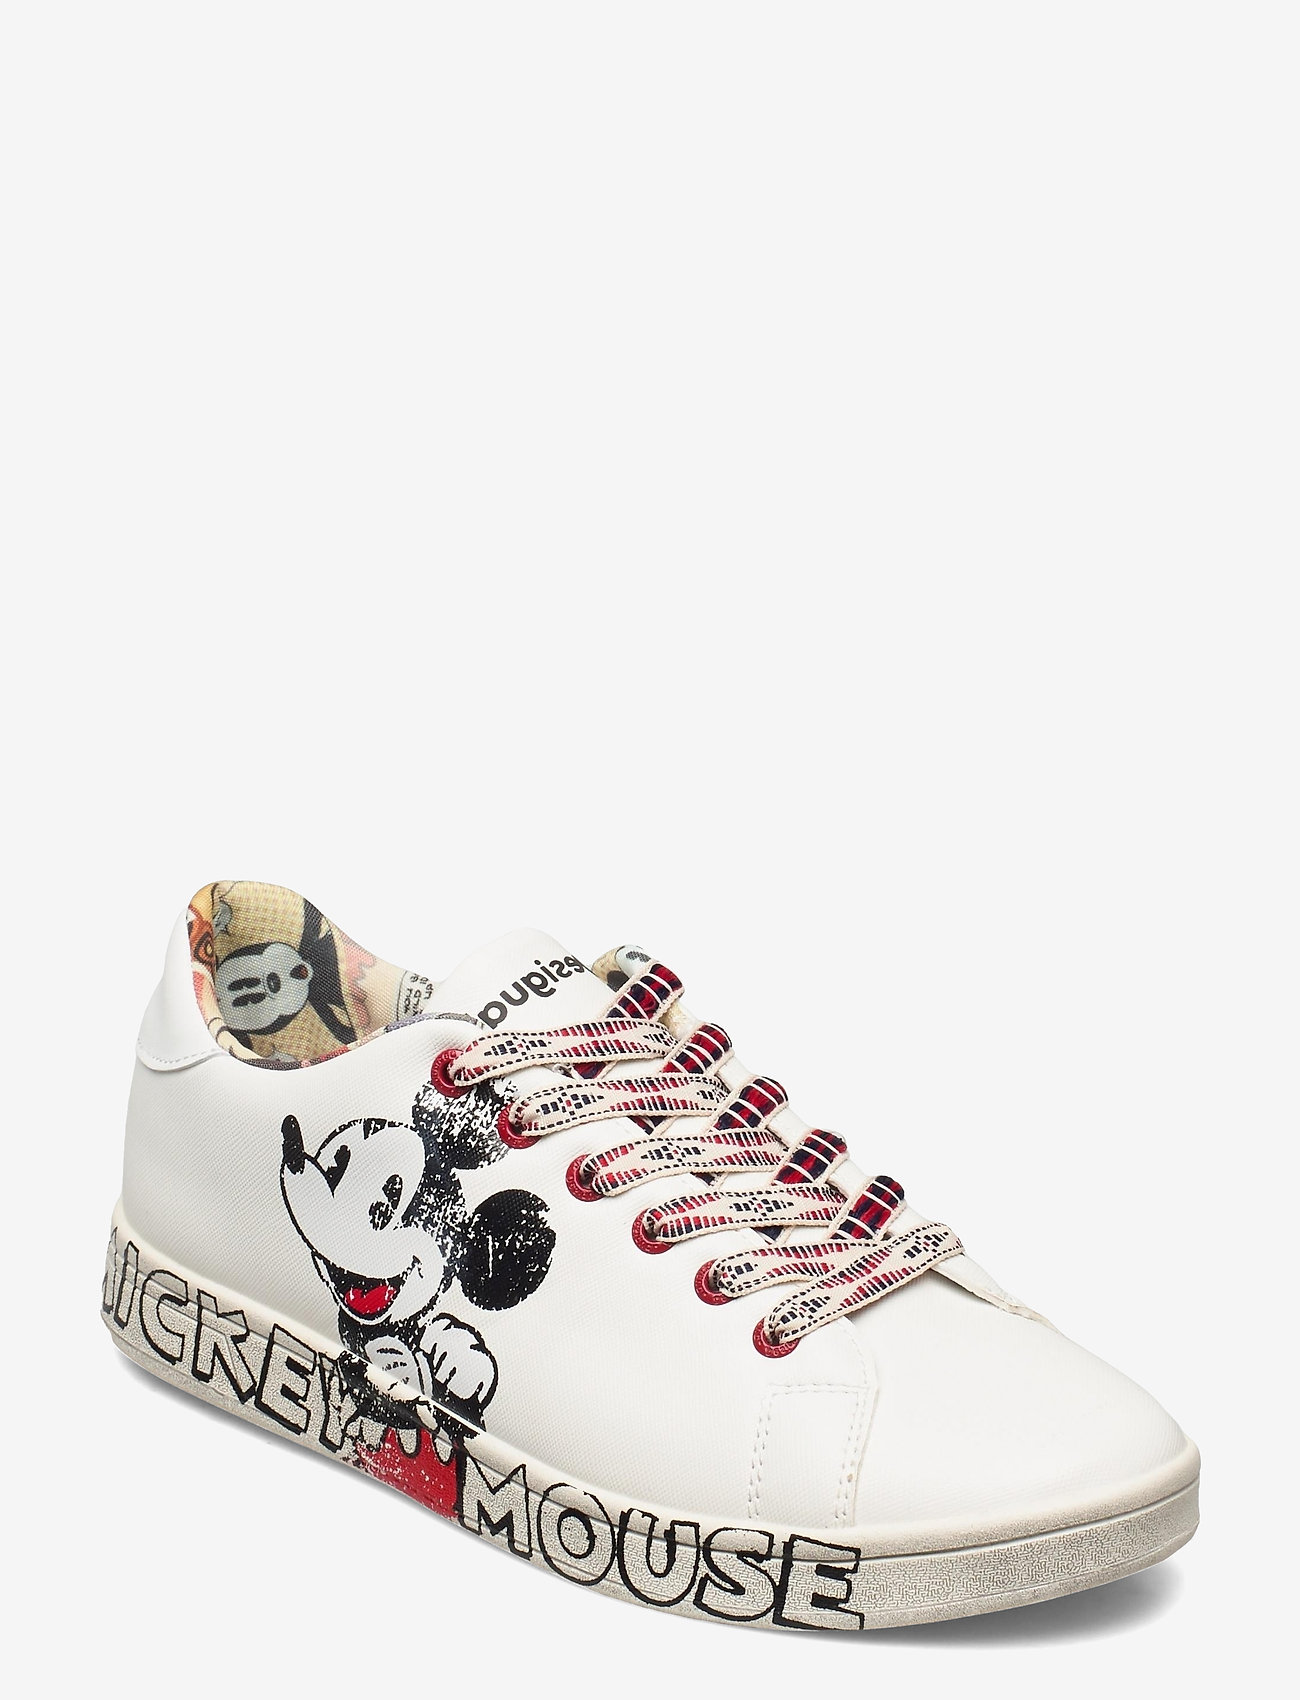 Desigual Shoes - SHOES COSMIC MICKEY - låga sneakers - blanco - 0